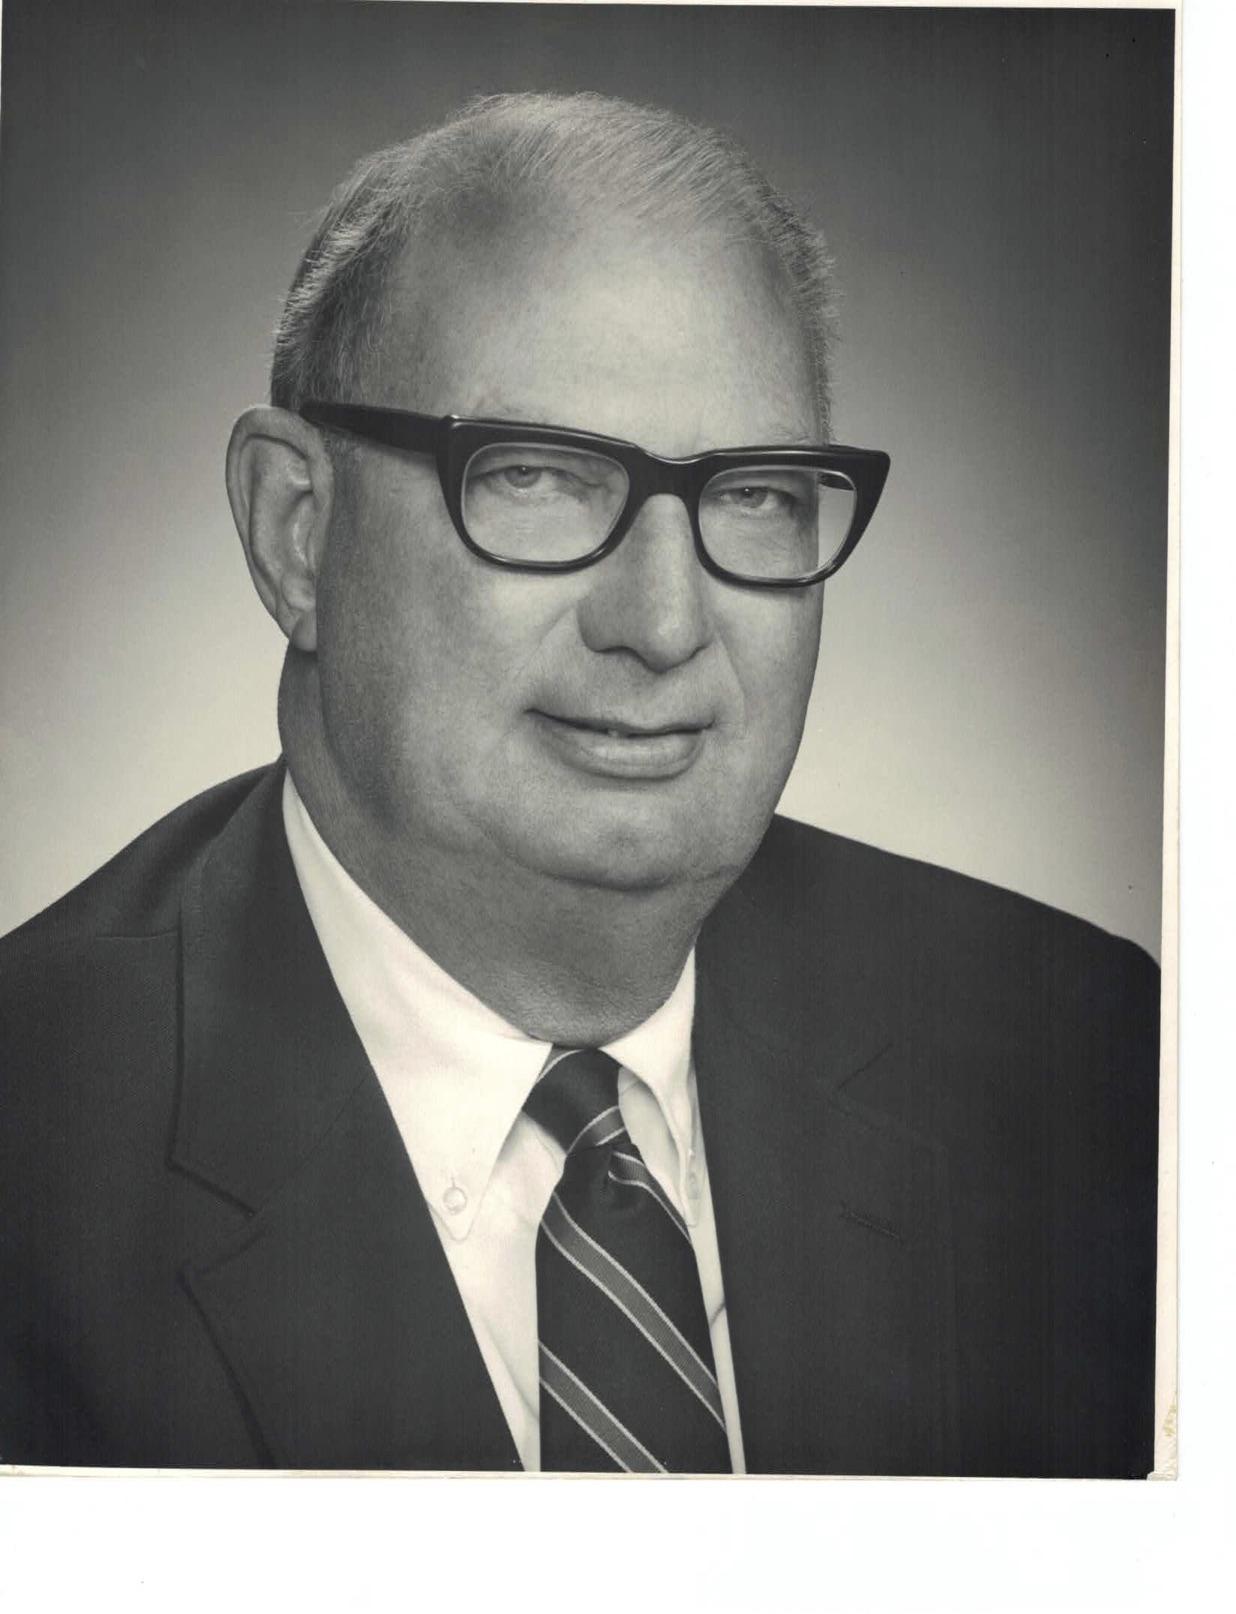 BURTON A. NELSON 1987-88